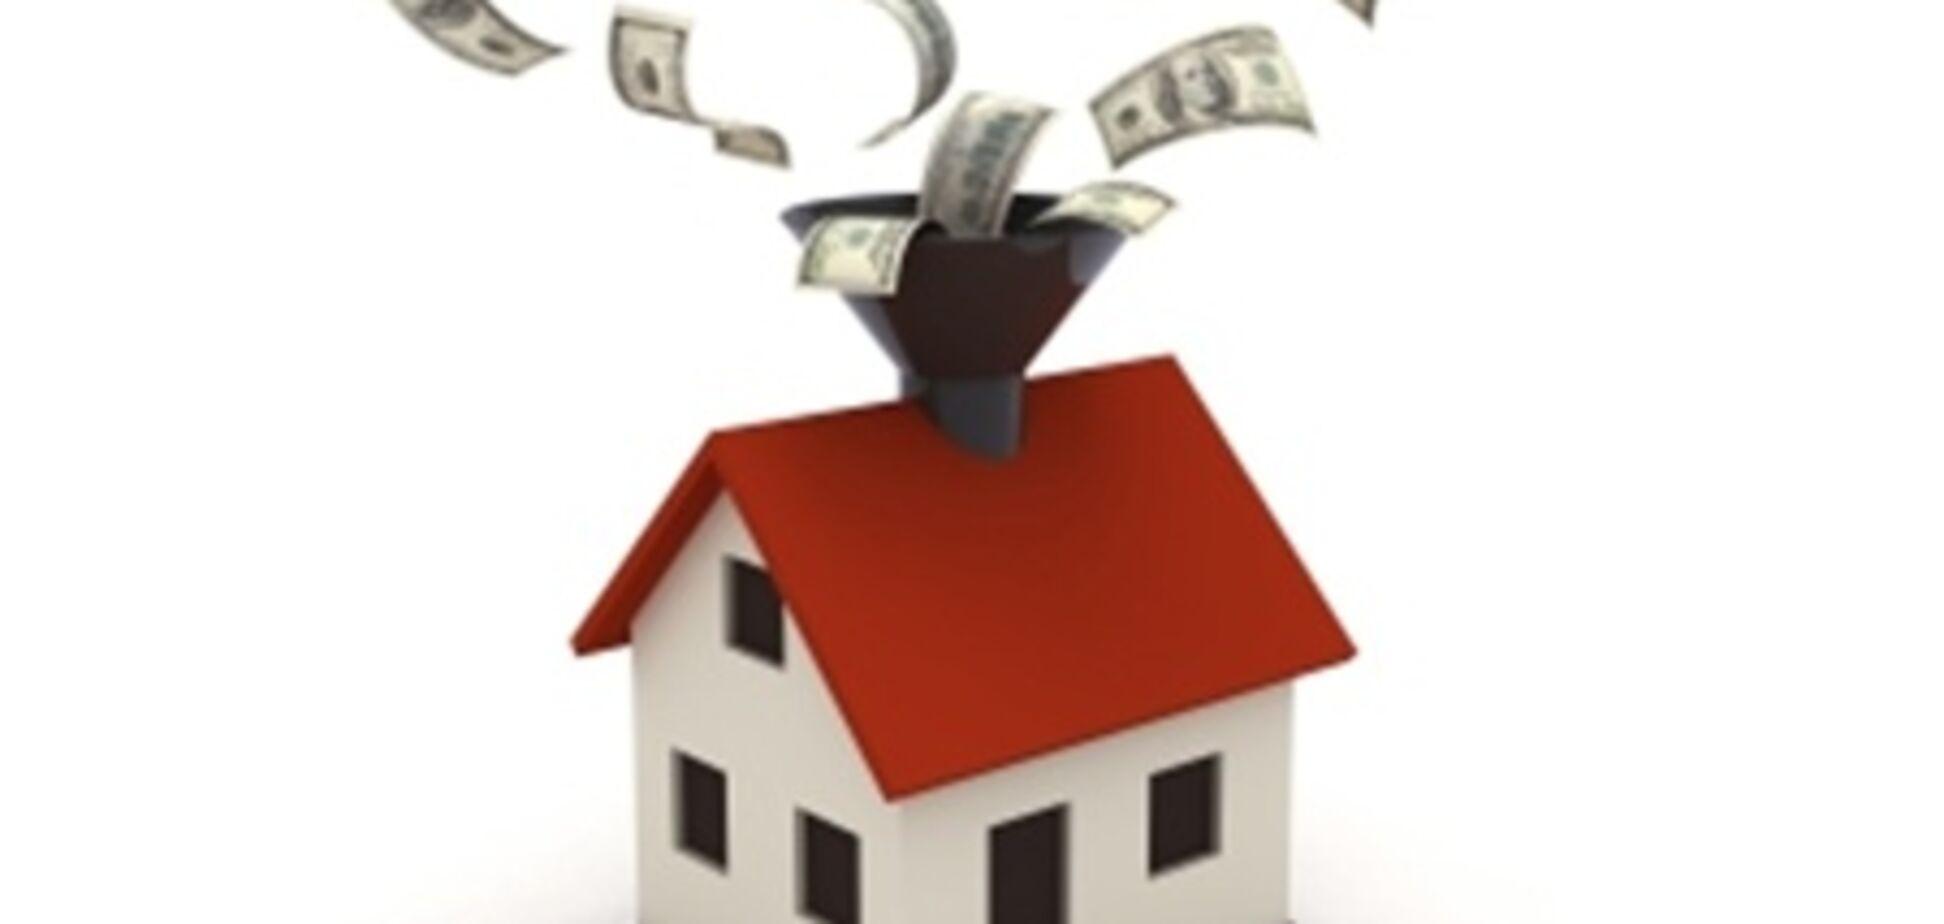 Банки активно дают ипотеку - глава ГИУ